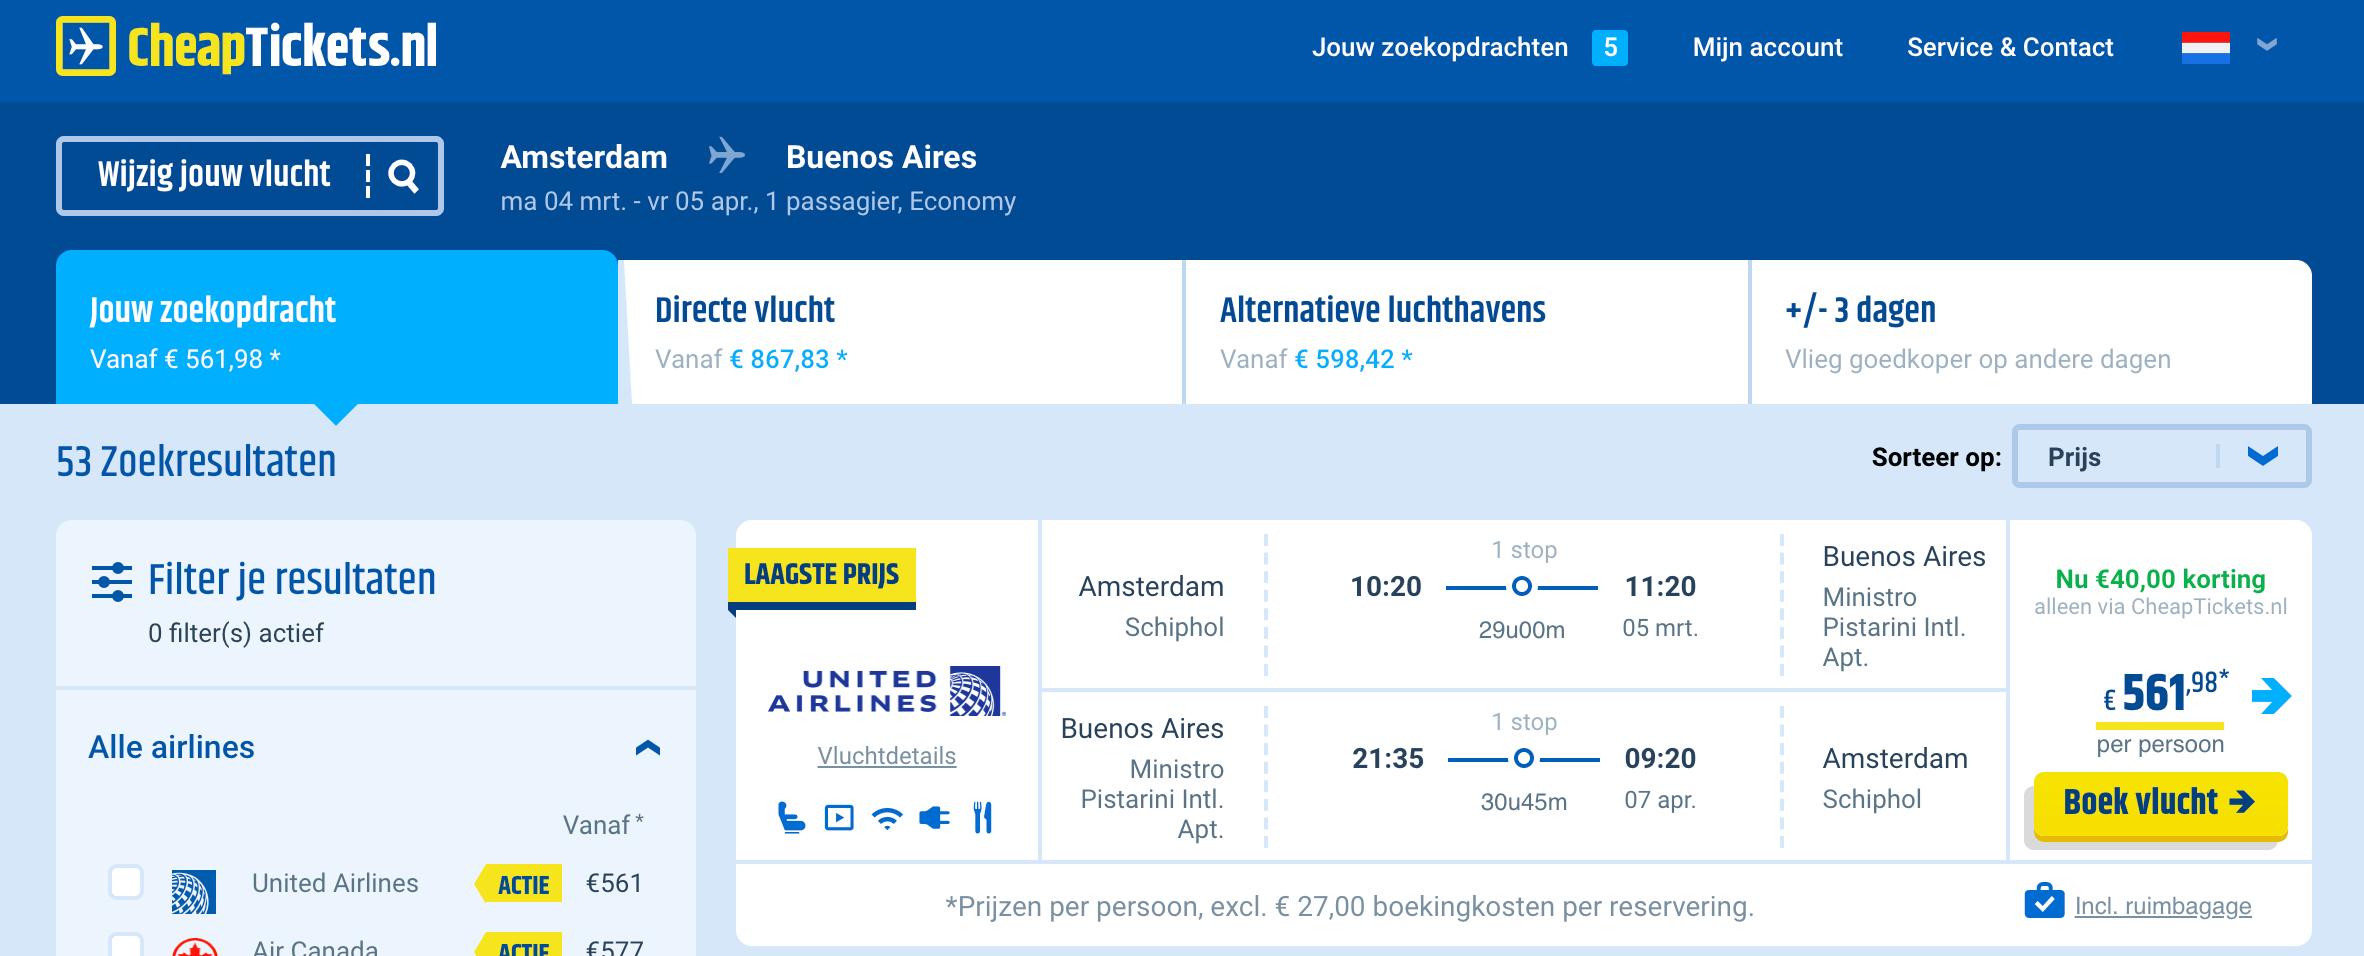 Vliegtickets naar Argentinië